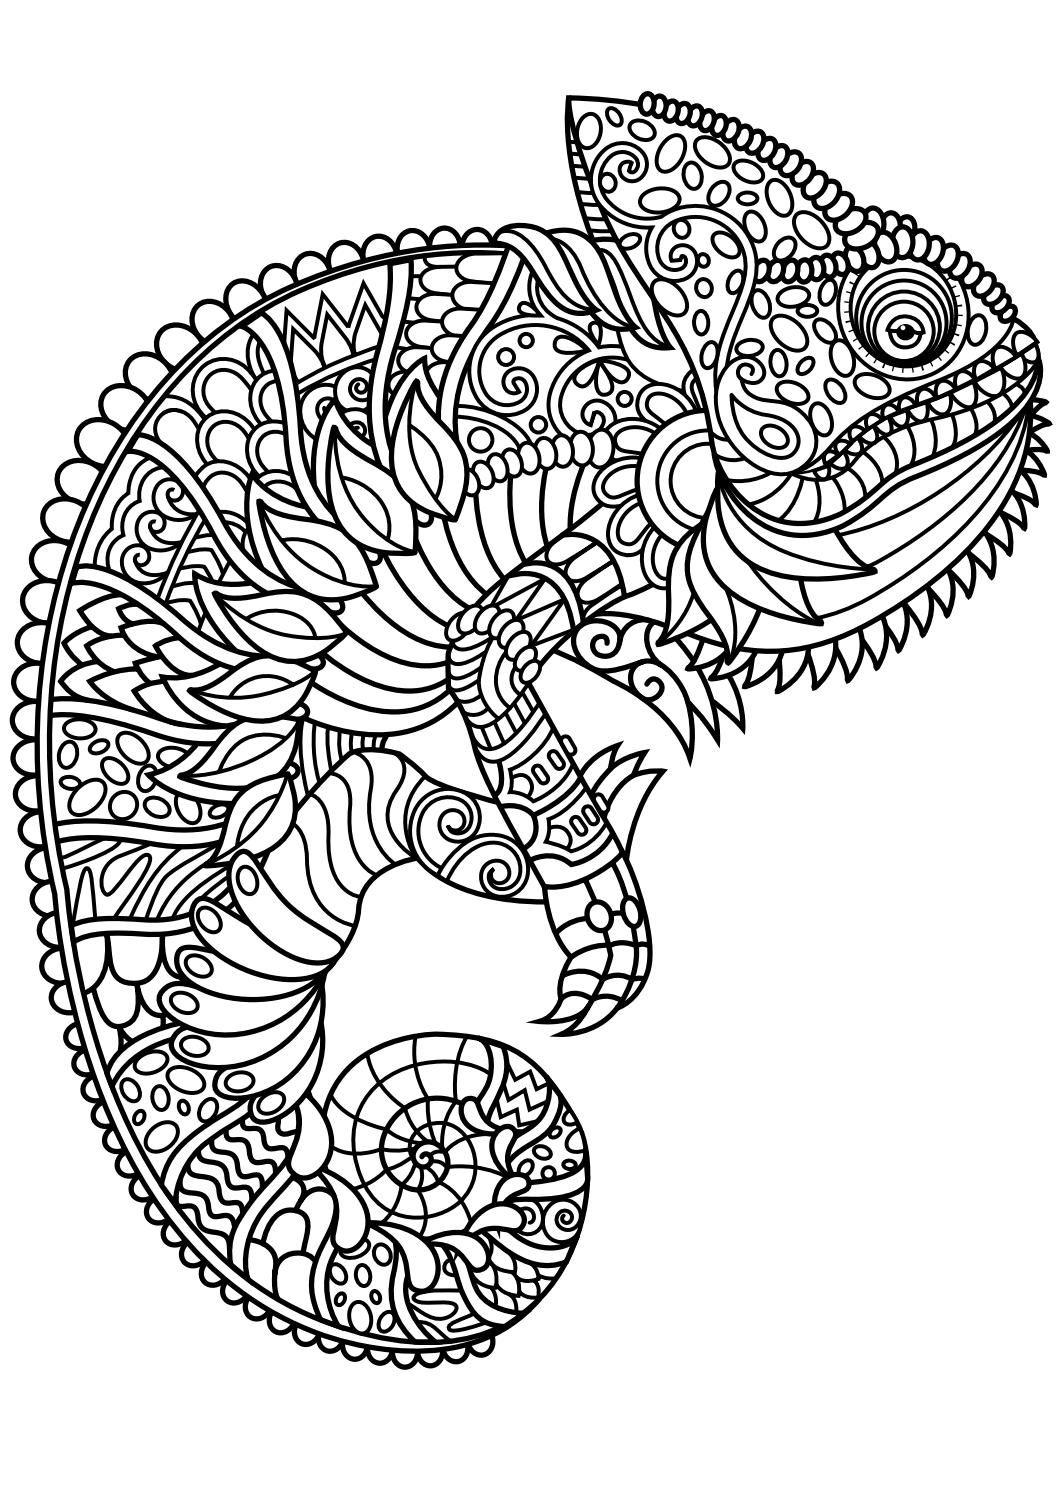 Animal coloring pages pdf colorir desenhos para colorir e para